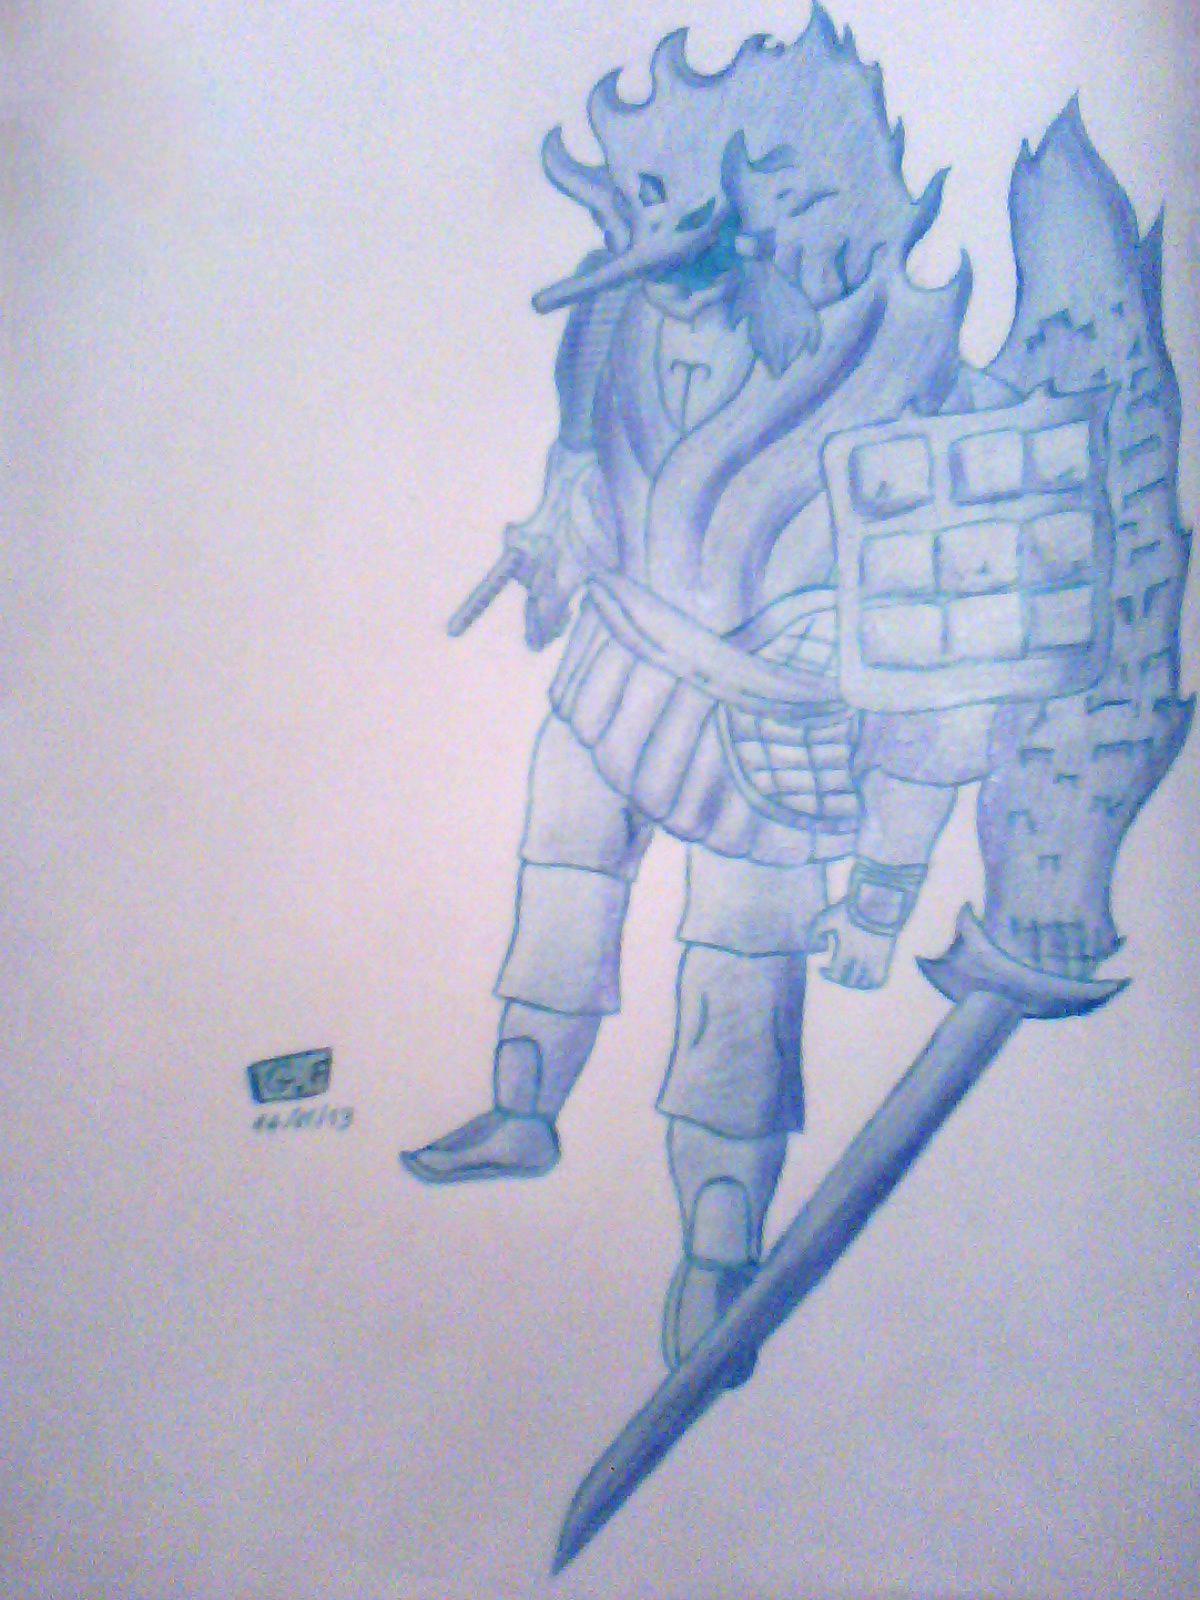 madara susanoo drawing - photo #27